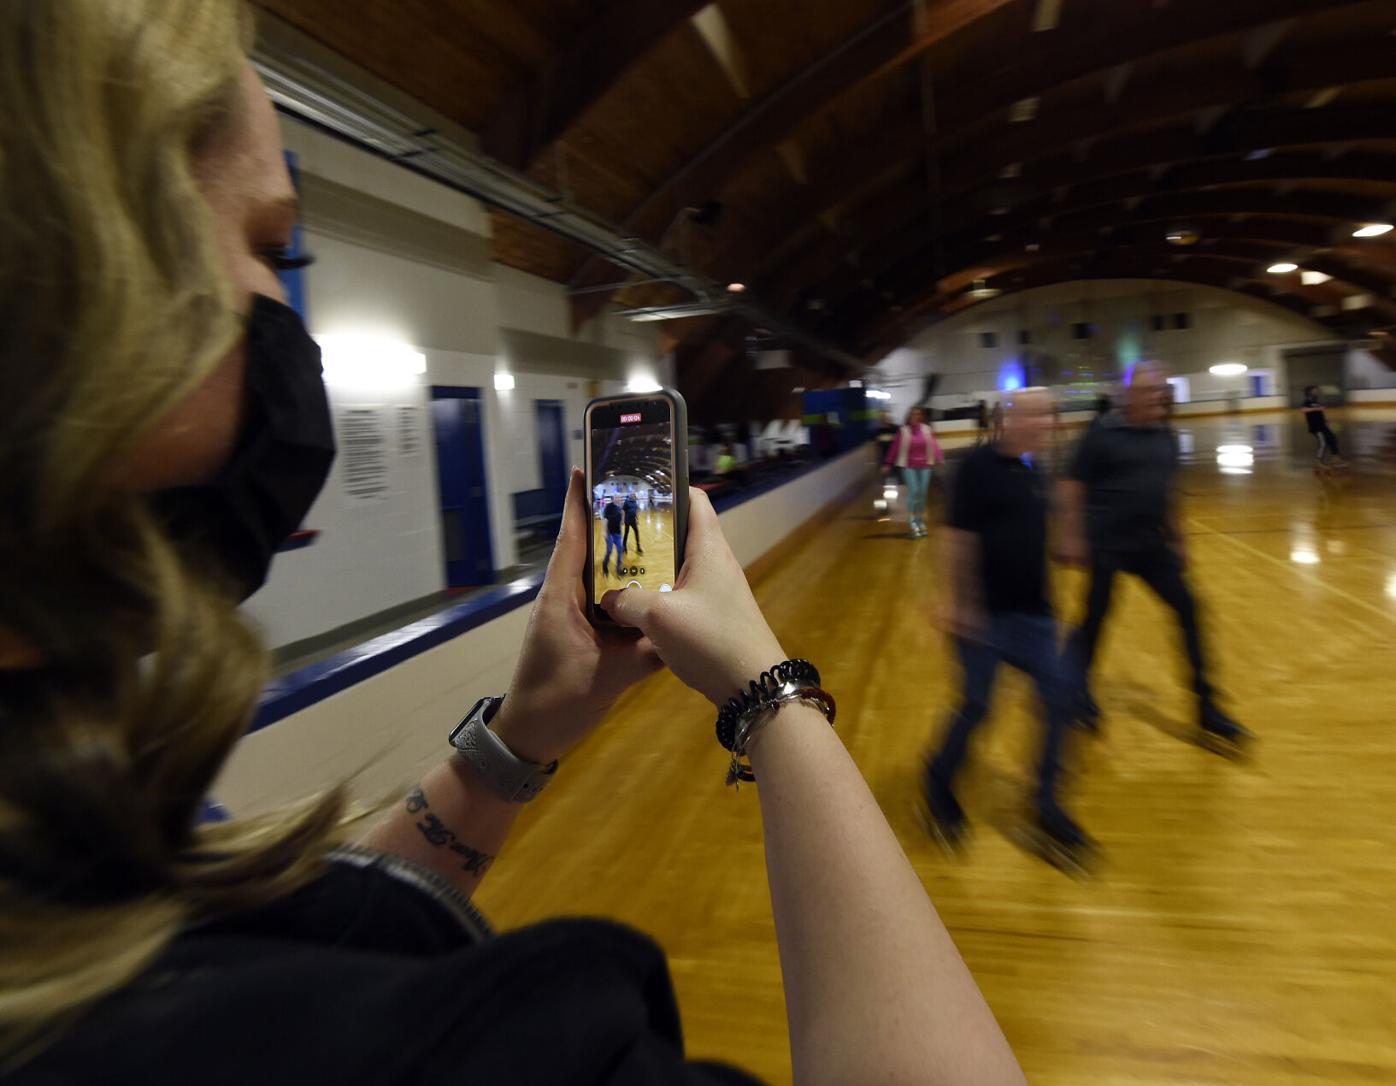 Dean Wenrich Viral Rollerskater